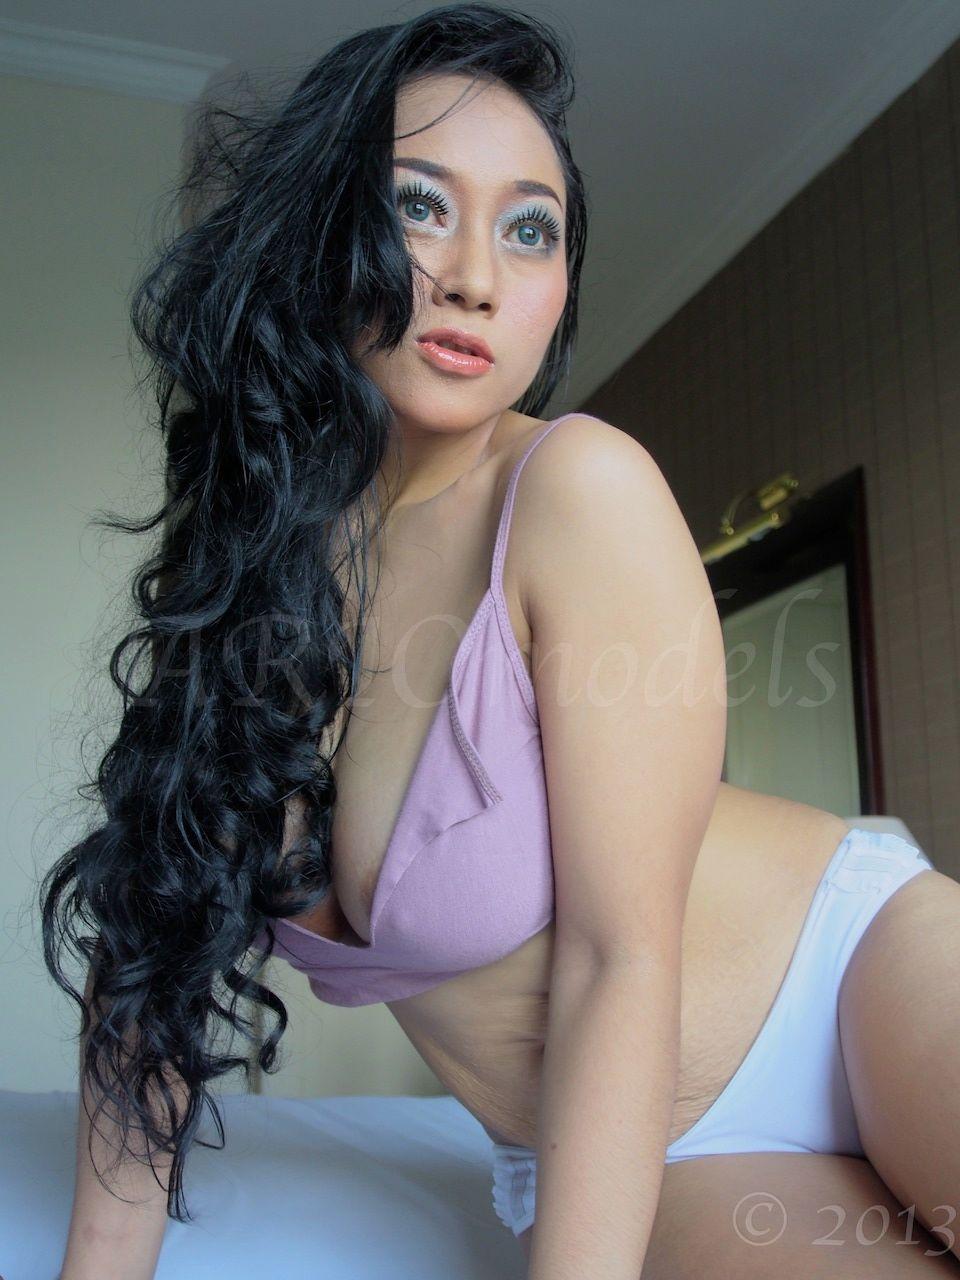 Foto Telanjang Sarah Ardheli Bikin Heboh Dunia Maya_Pada foto di bawah ...